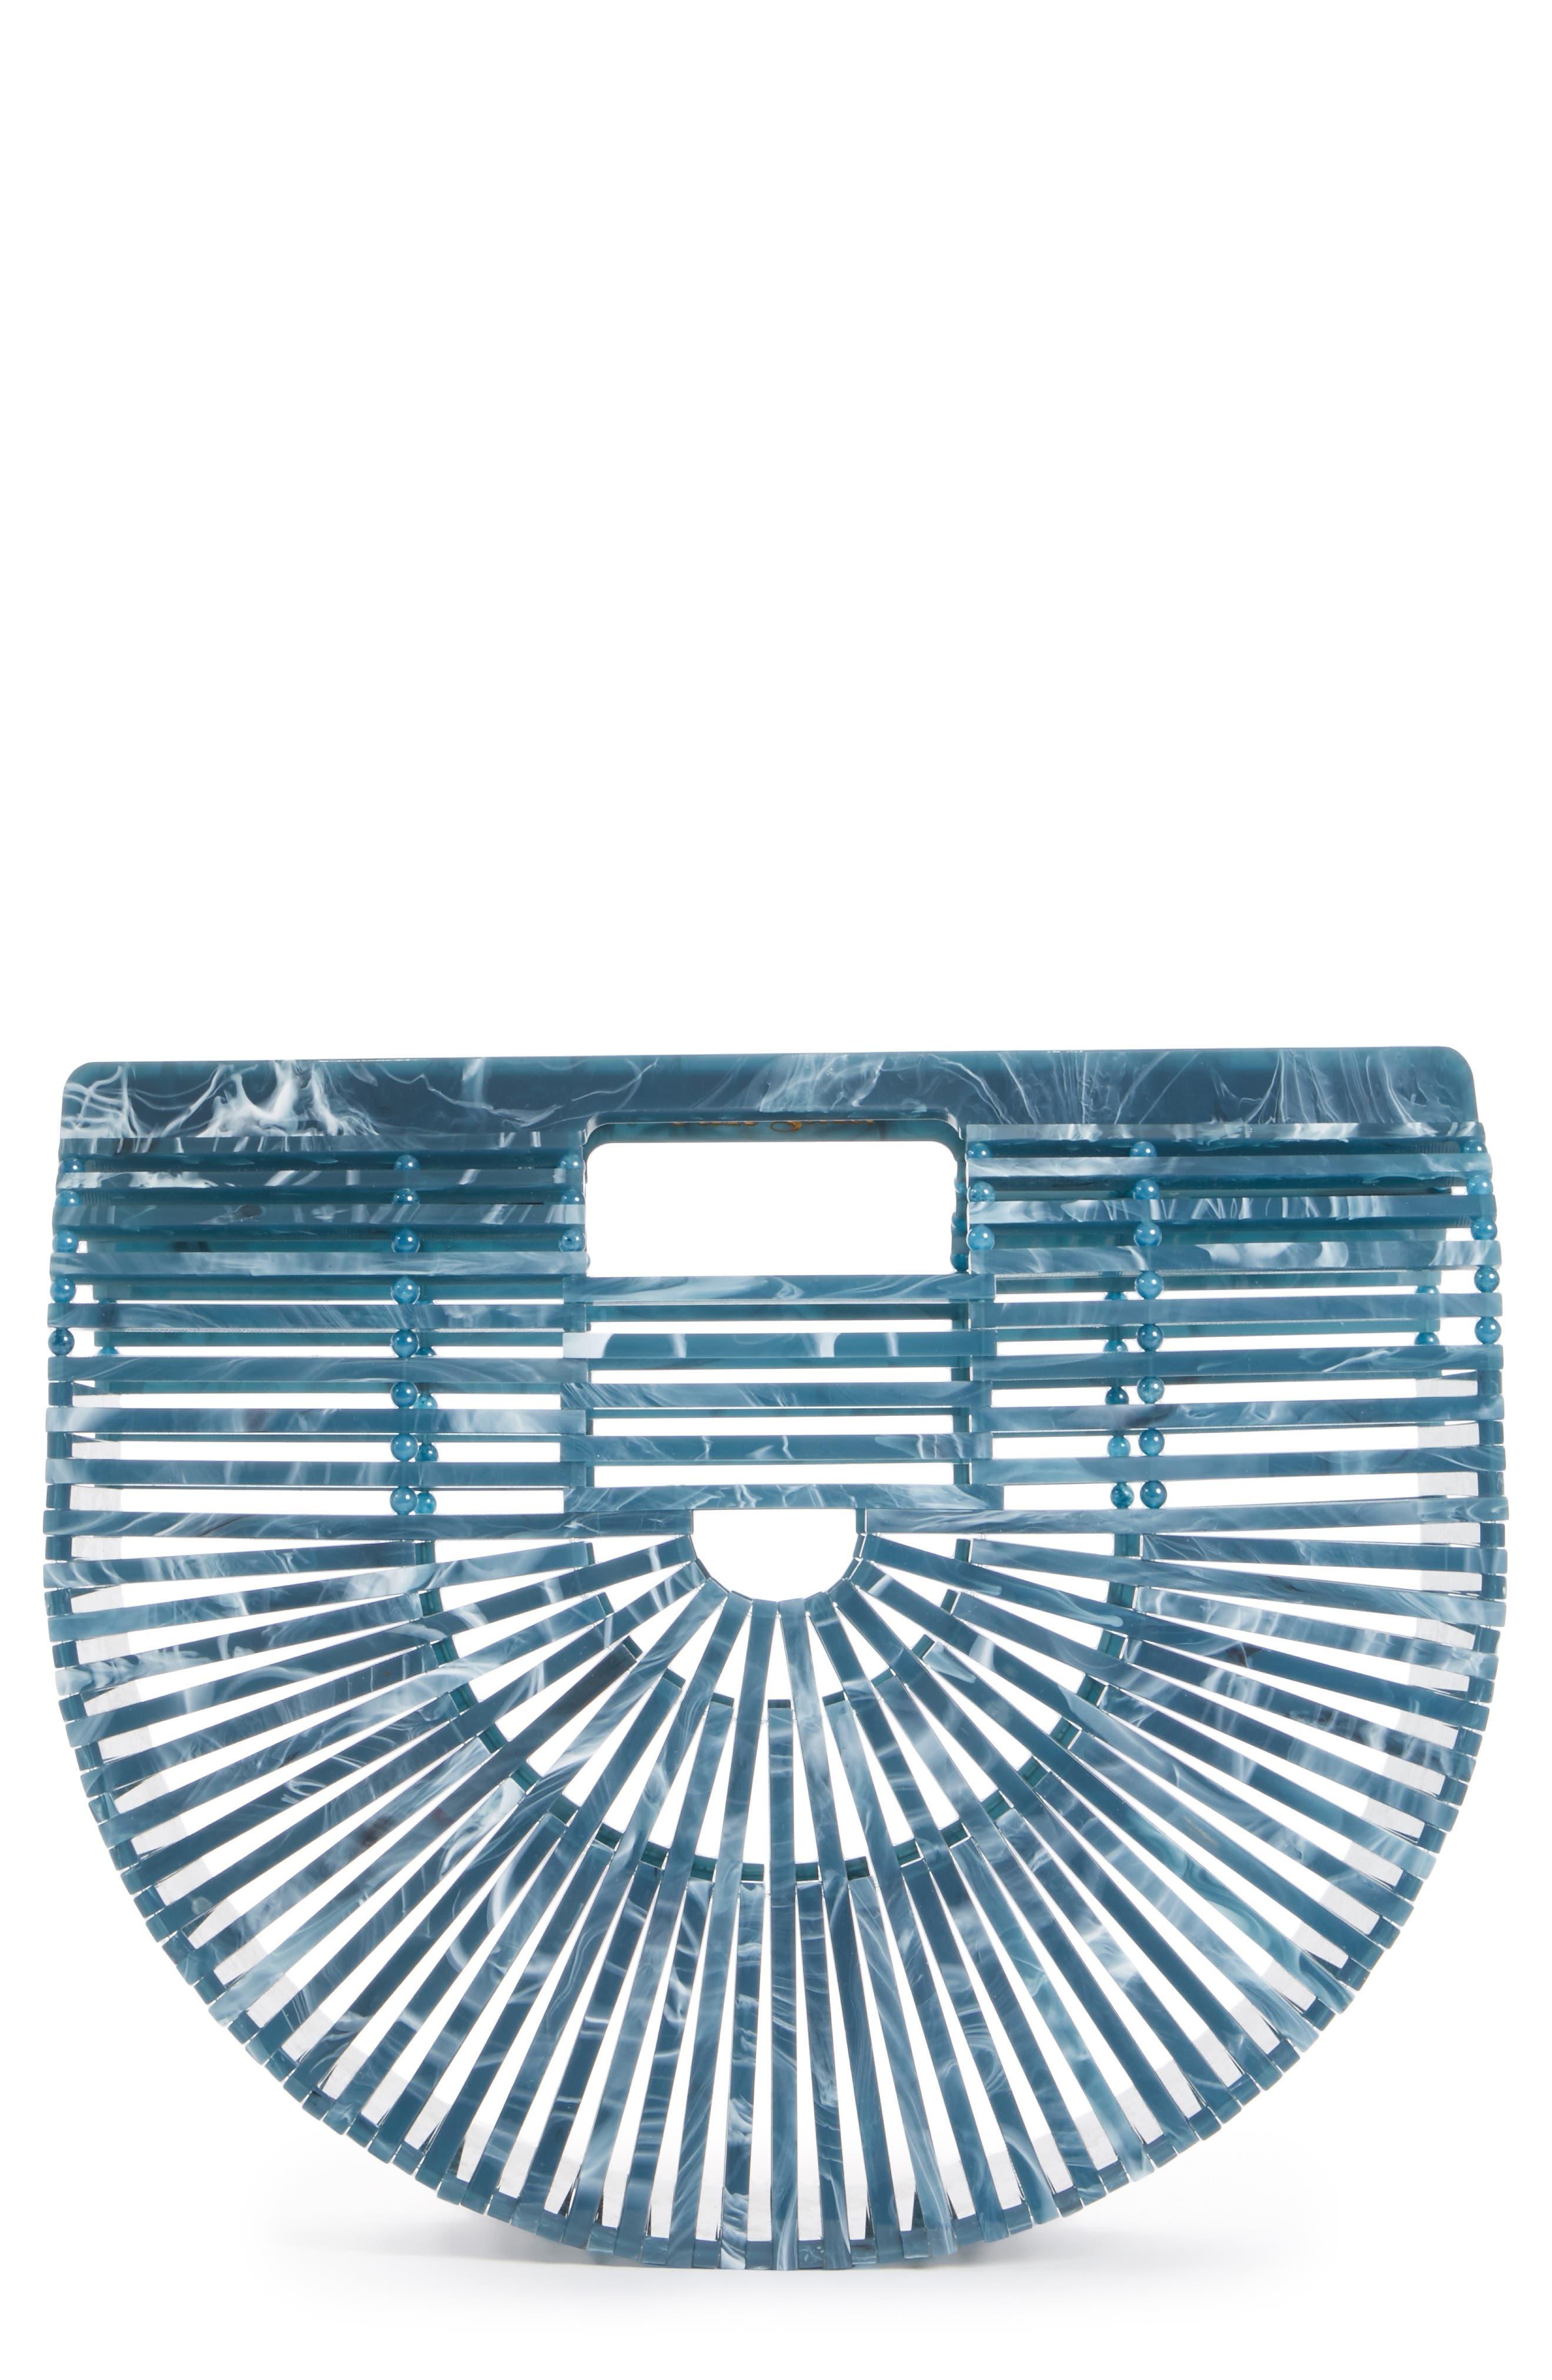 Alternate Image 1 Selected - Cult Gaia Small Ark Handbag